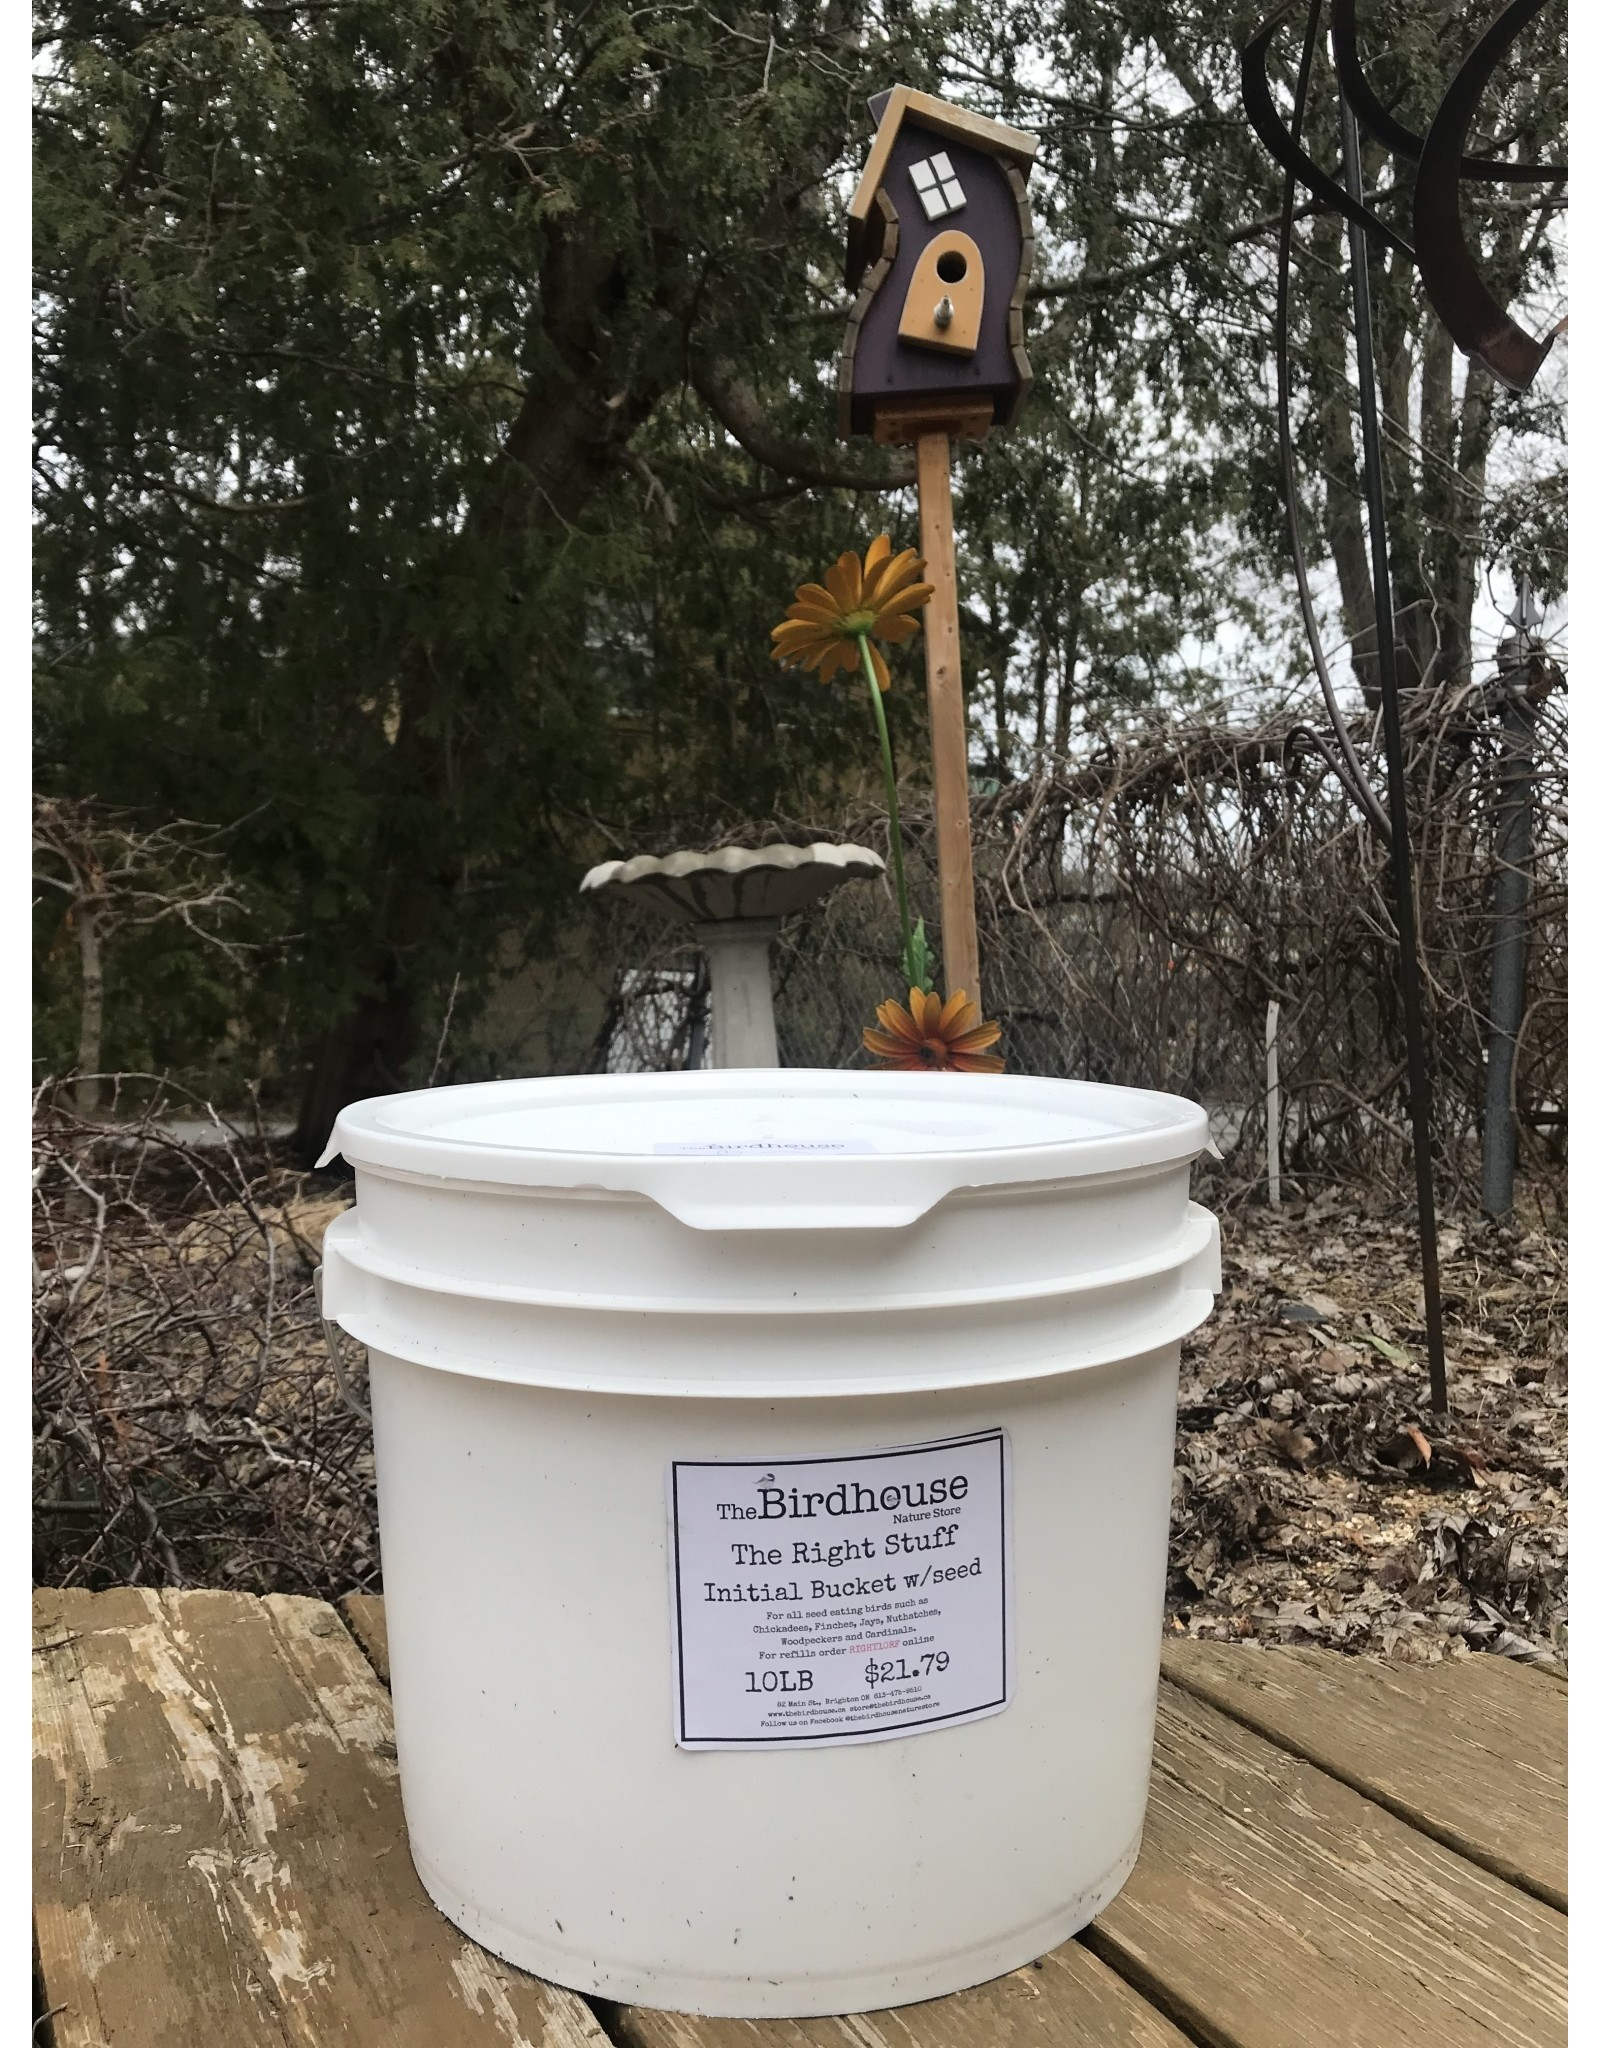 The Birdhouse Refill Program RIGHT10BKT Initial 10lb Right Stuff W/Refill Program Bucket